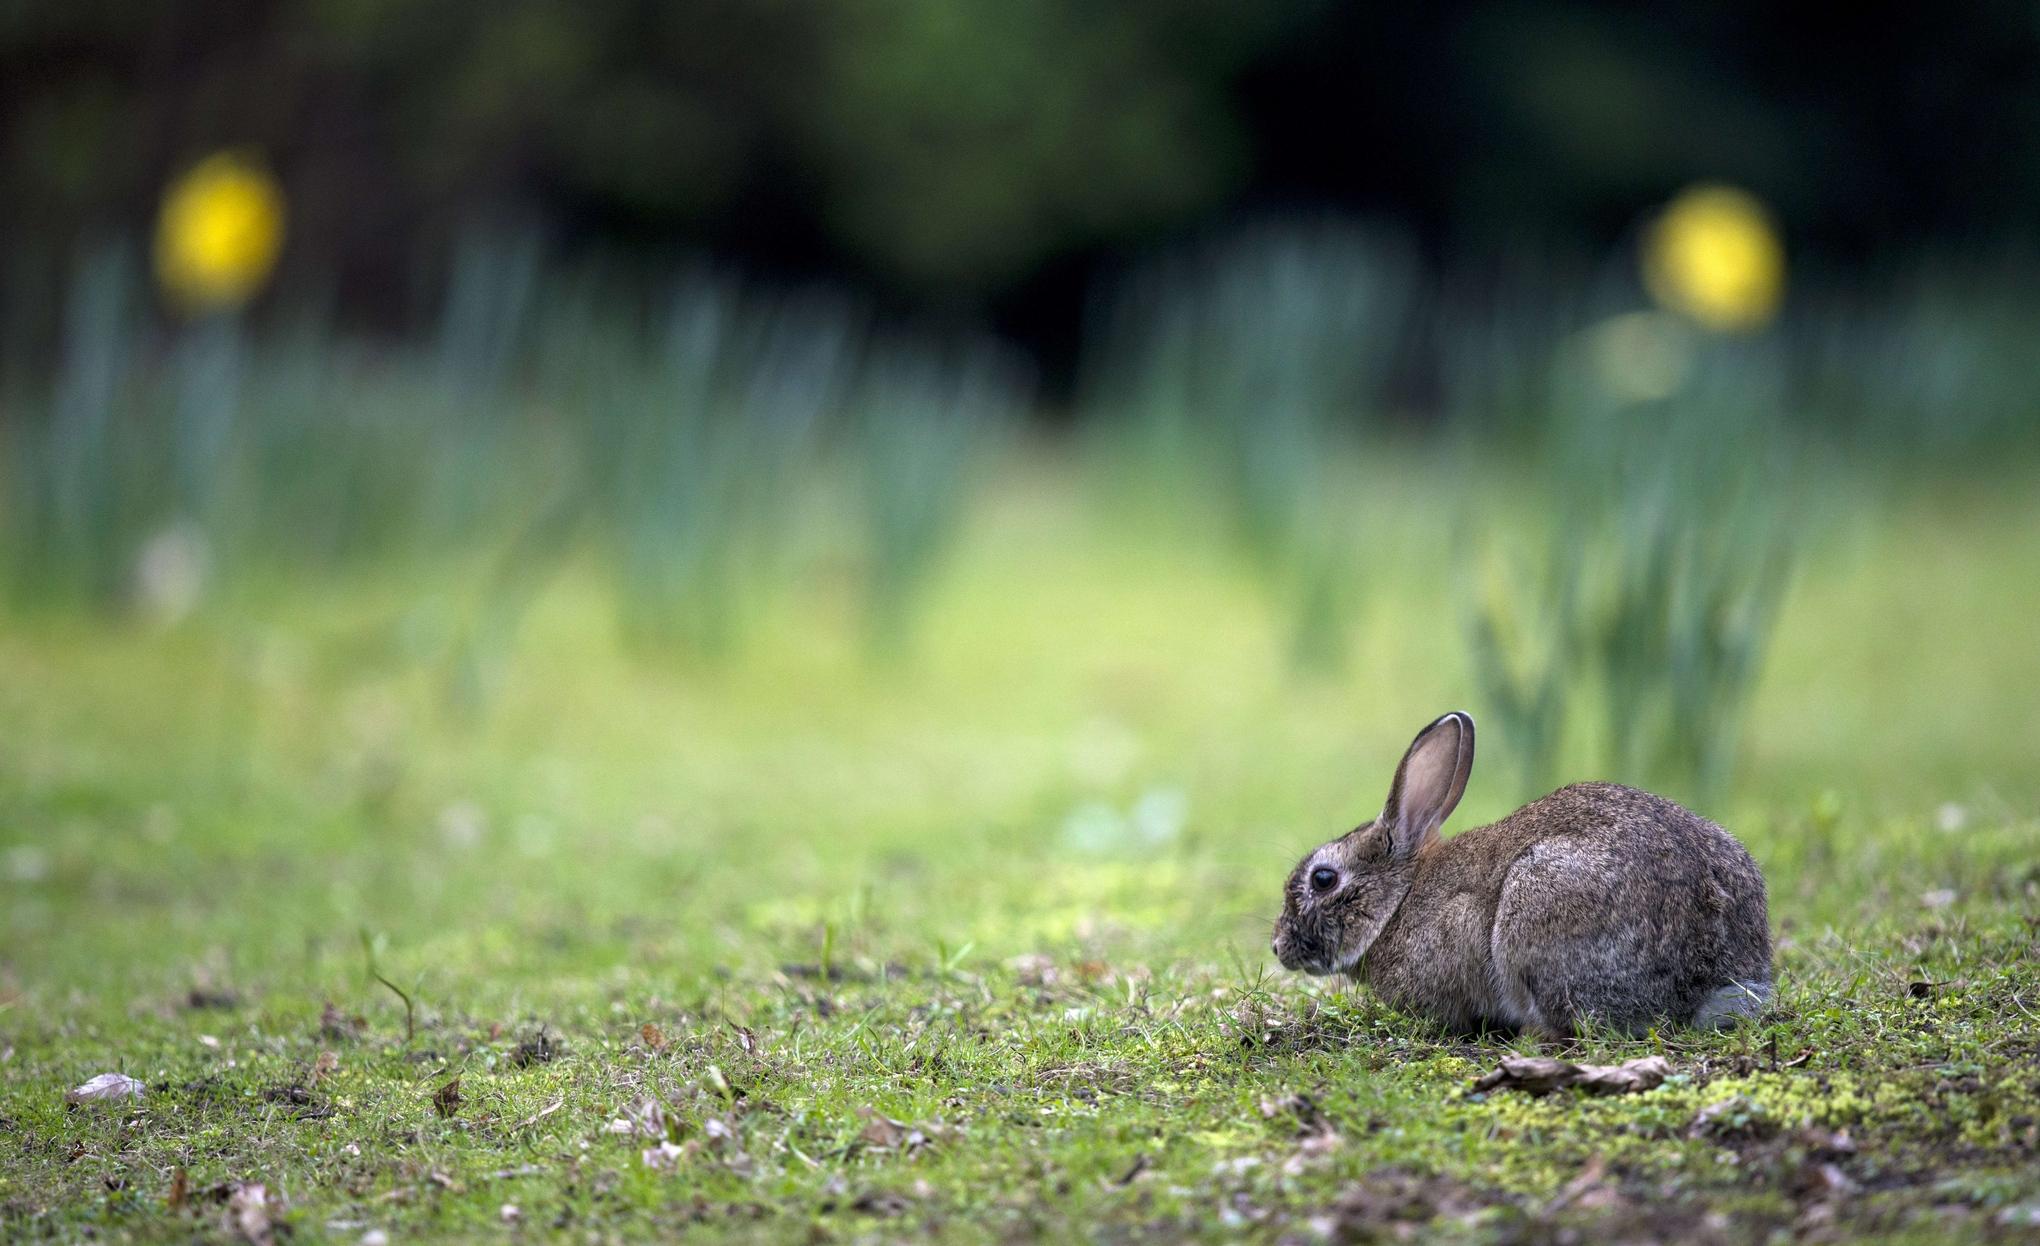 A rabbit is pictured on March 28, 2014 in Berlin's Tiergarten park.